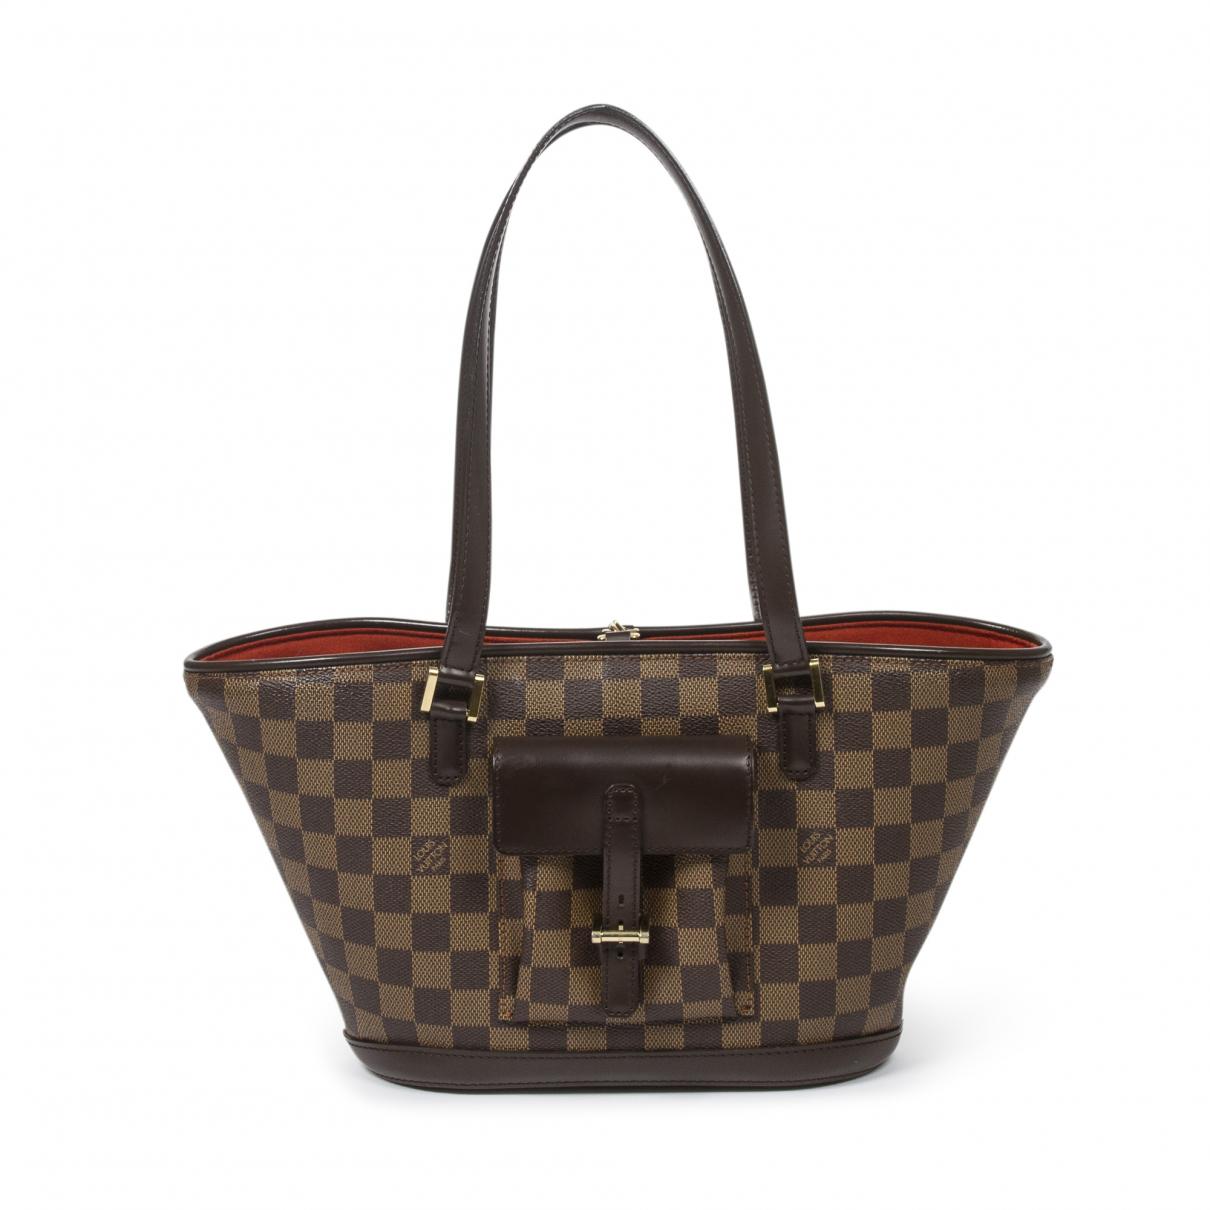 Louis Vuitton - Sac a main Manosque pour femme en cuir - marron